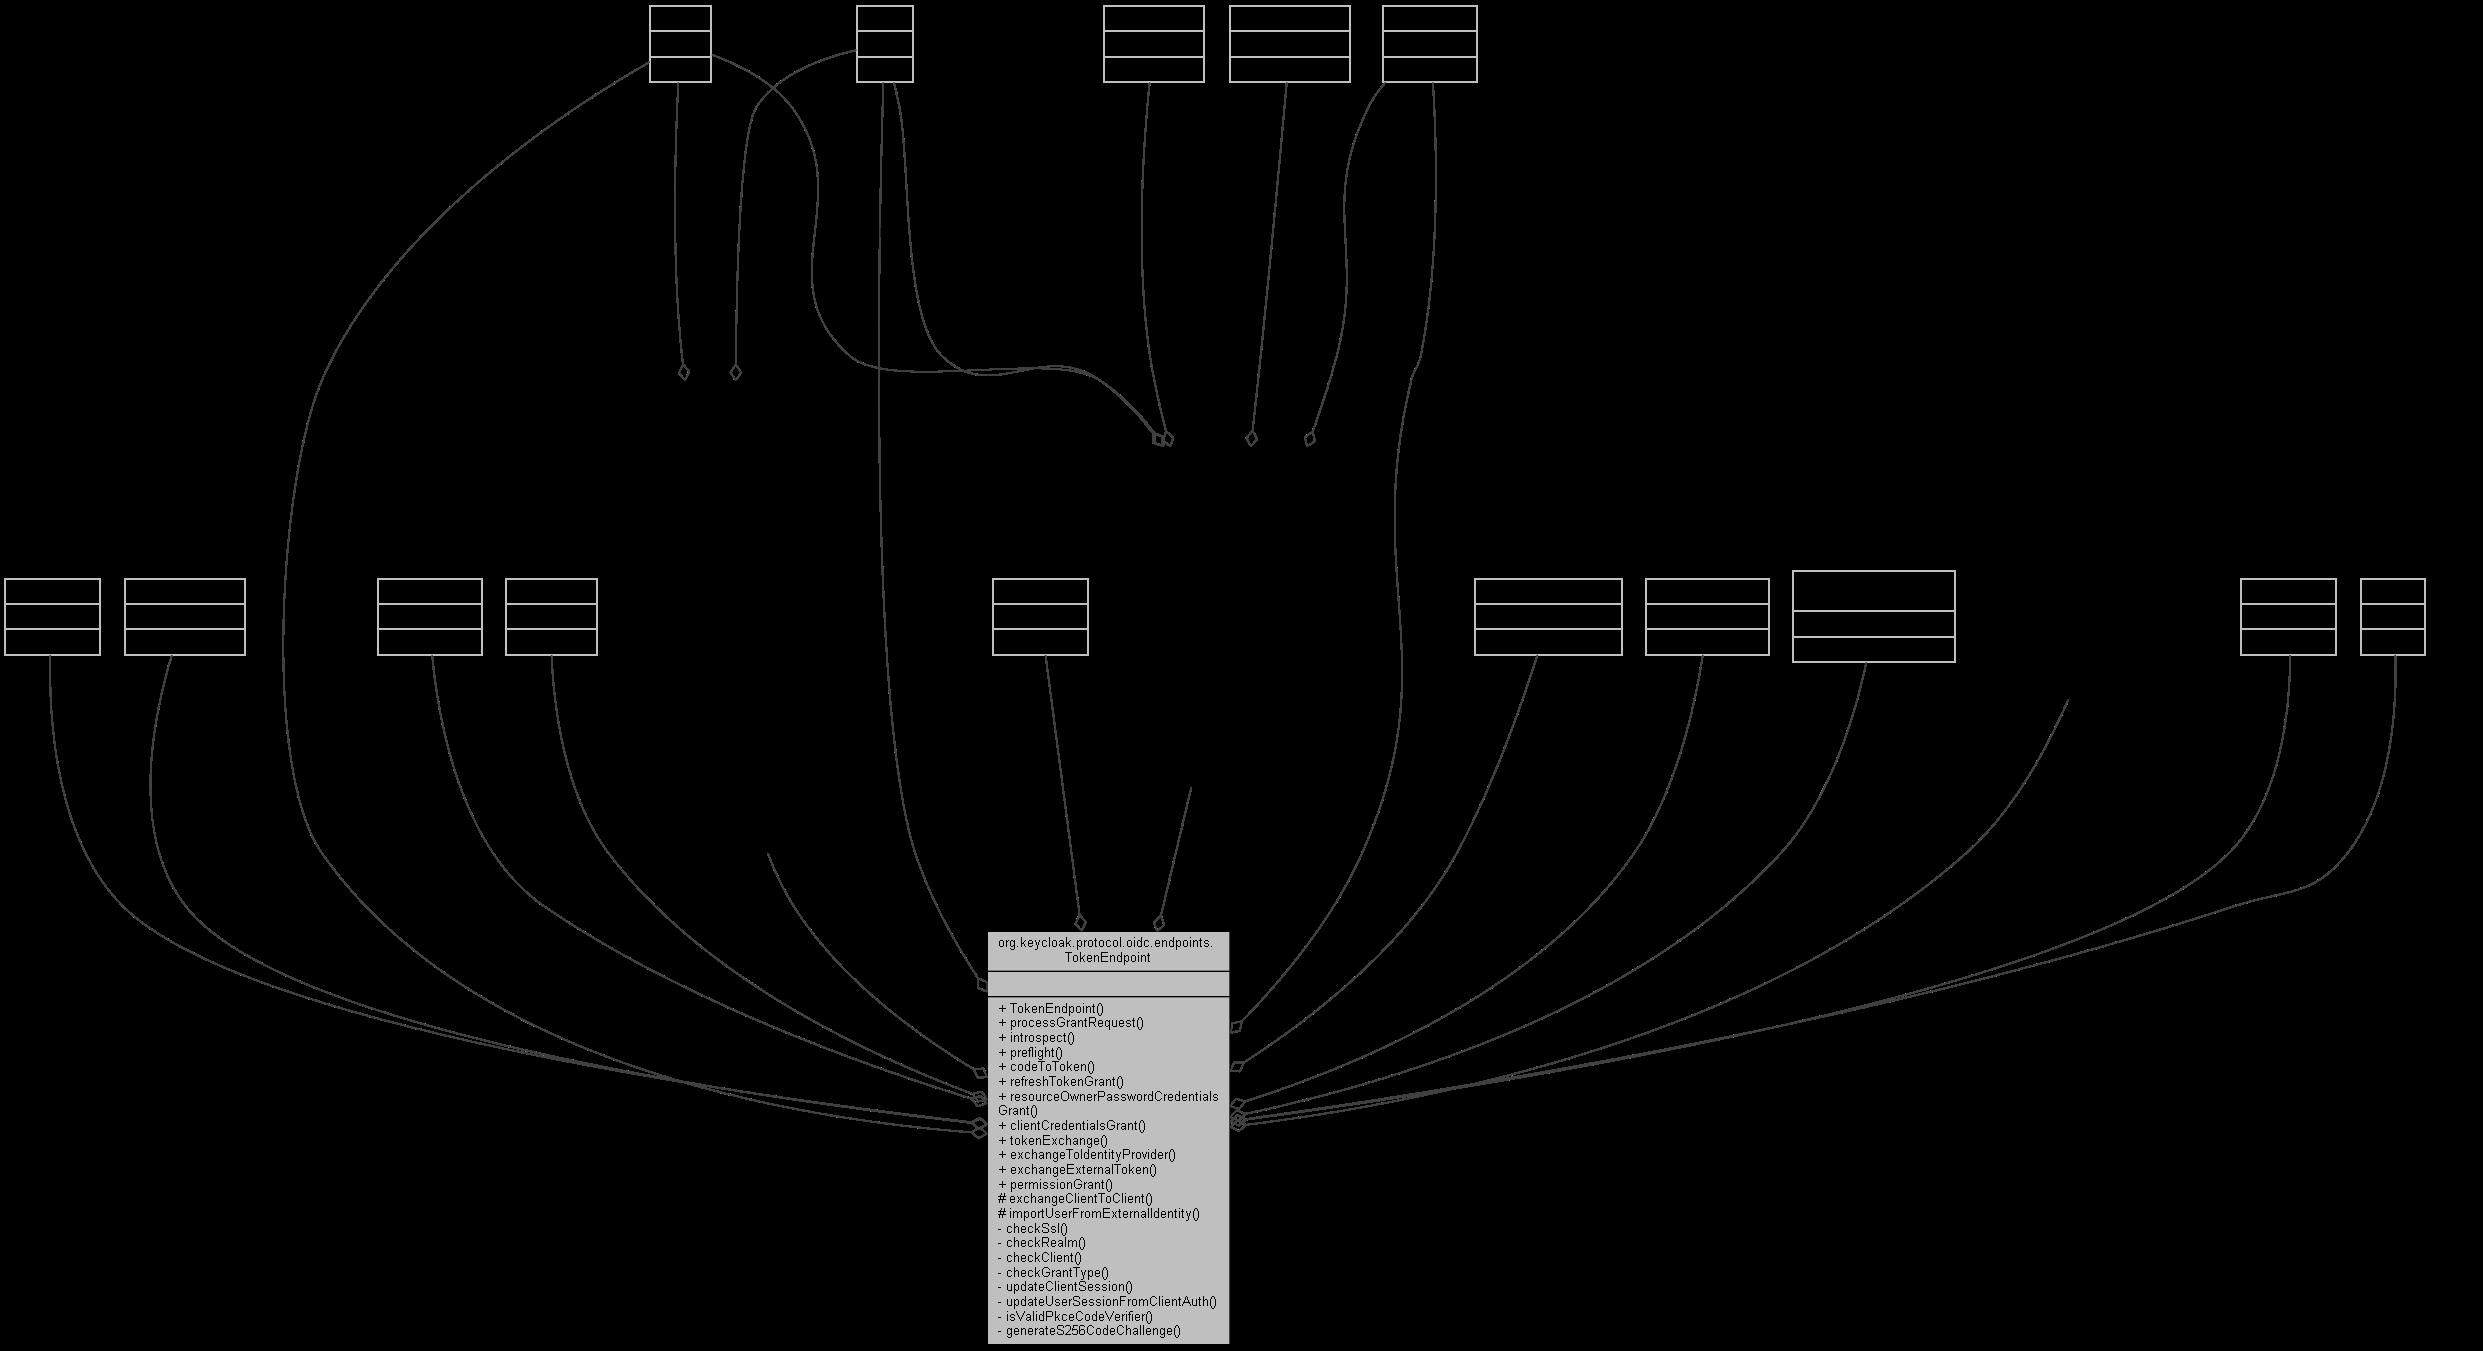 keycloak-service: org keycloak protocol oidc endpoints TokenEndpoint